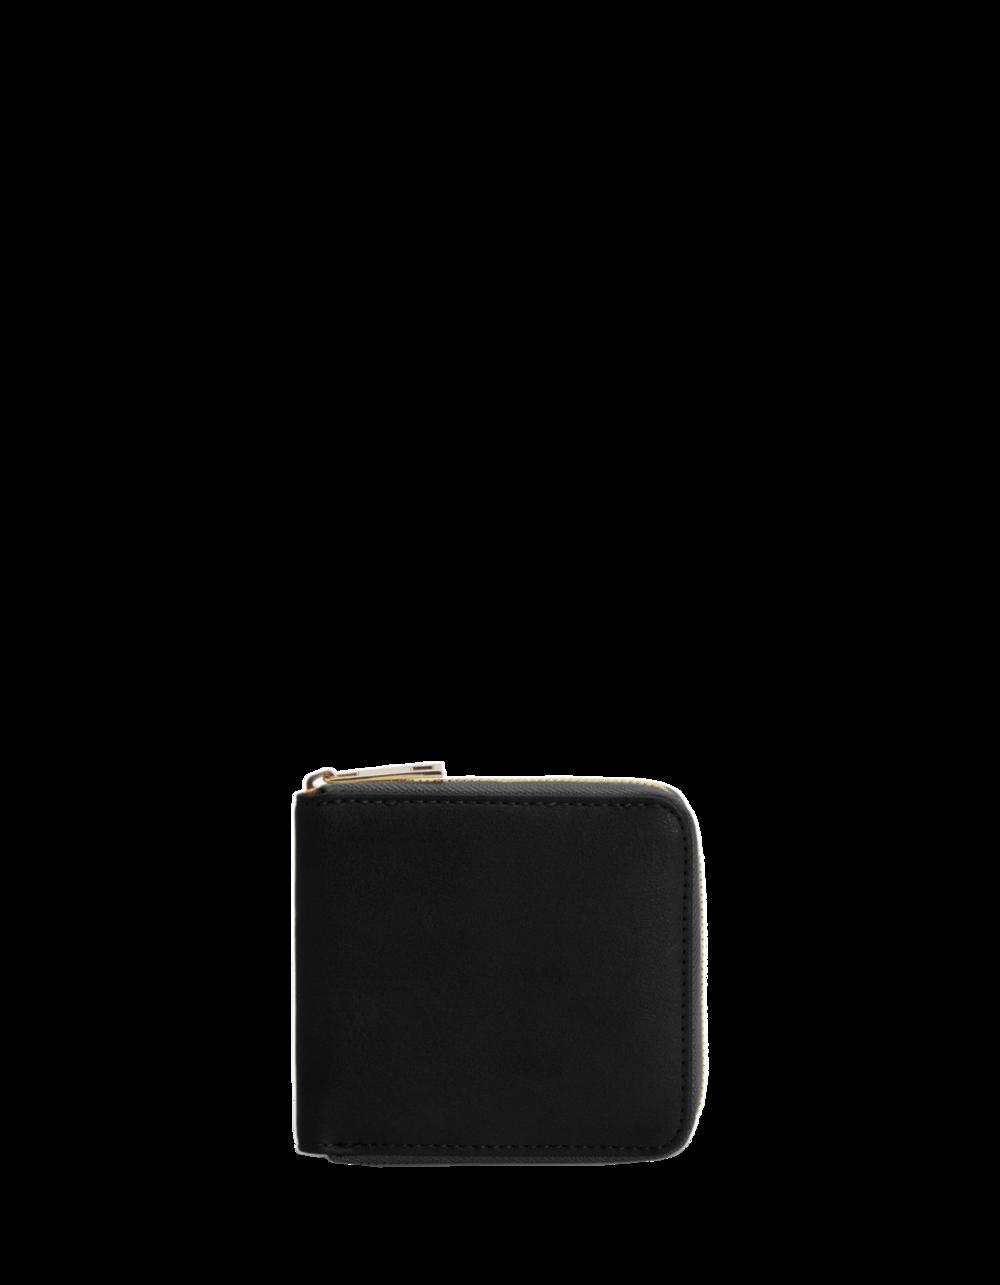 StradivariusMan_accessories (76).png